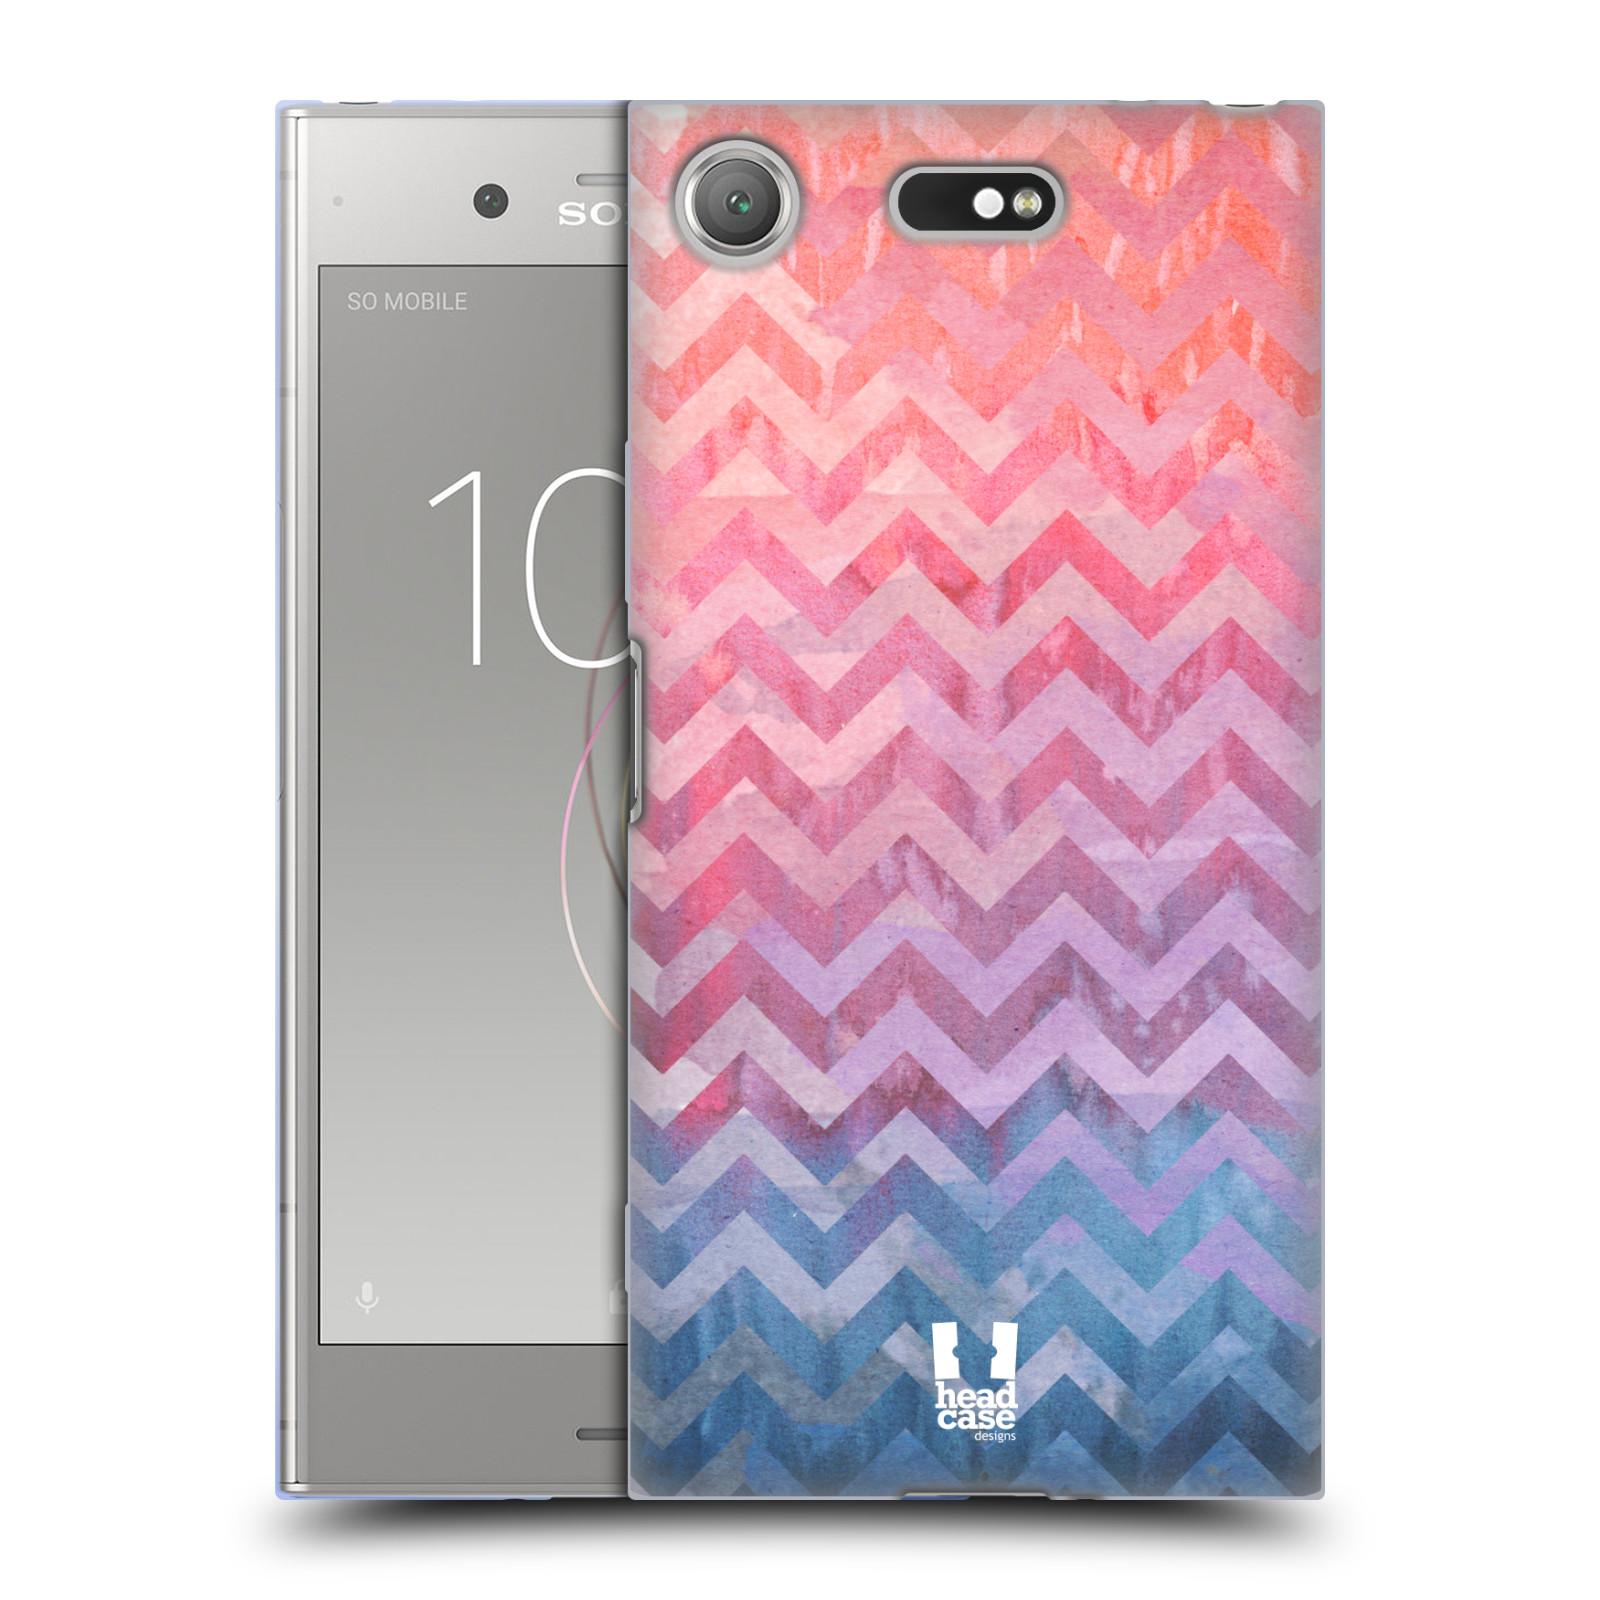 Silikonové pouzdro na mobil Sony Xperia XZ1 Compact - Head Case - Pink Chevron (Silikonový kryt či obal na mobilní telefon Sony Xperia XZ1 Compact G8441 s motivem Pink Chevron)